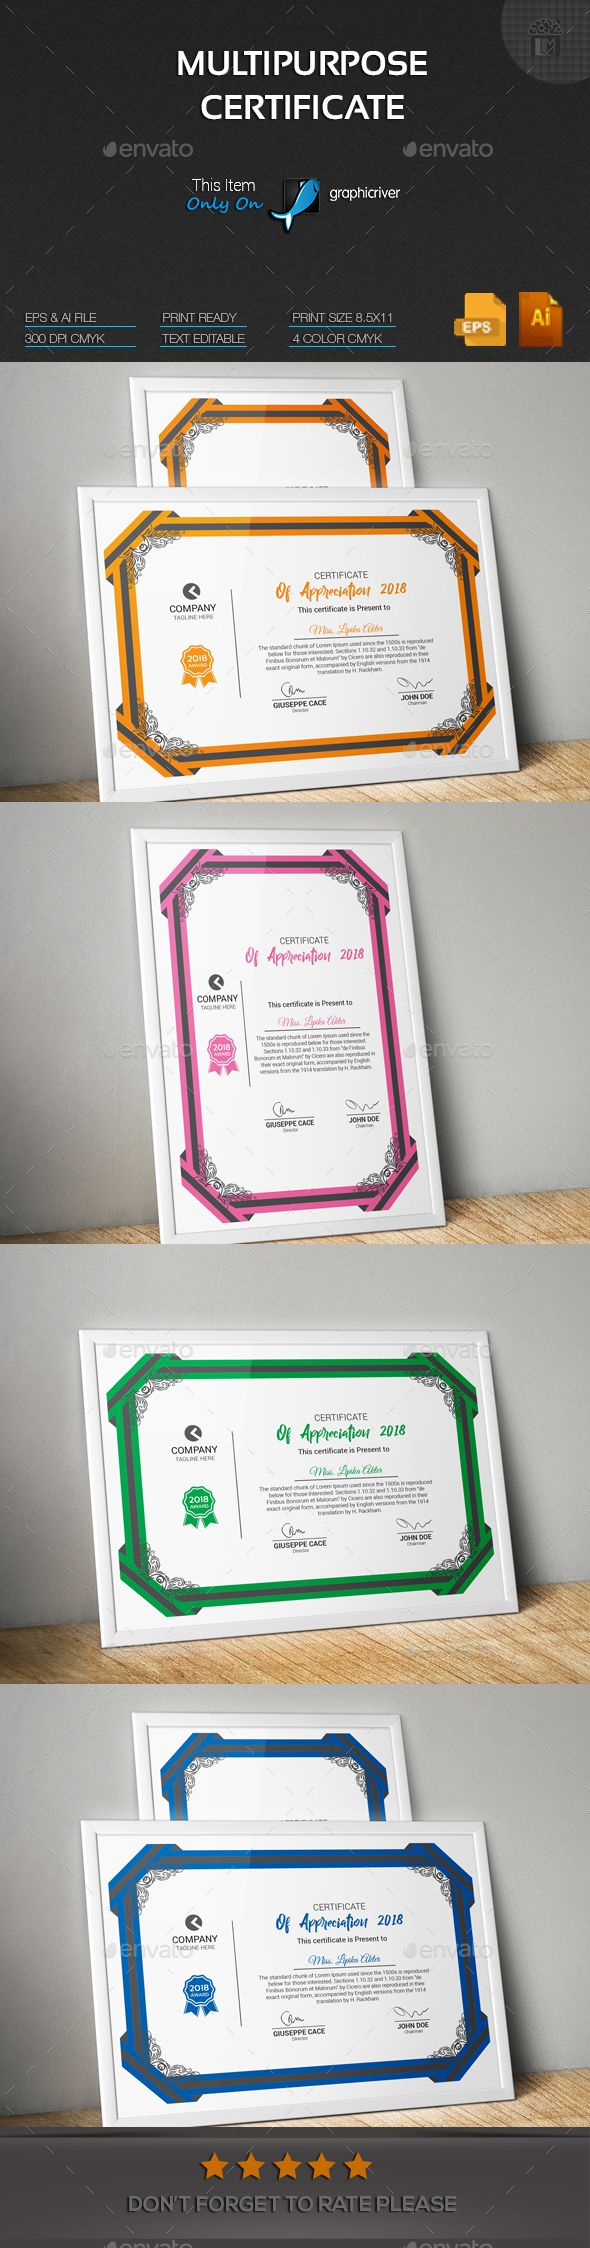 Multipurpose Certificate | Pinterest | Certificate, Template